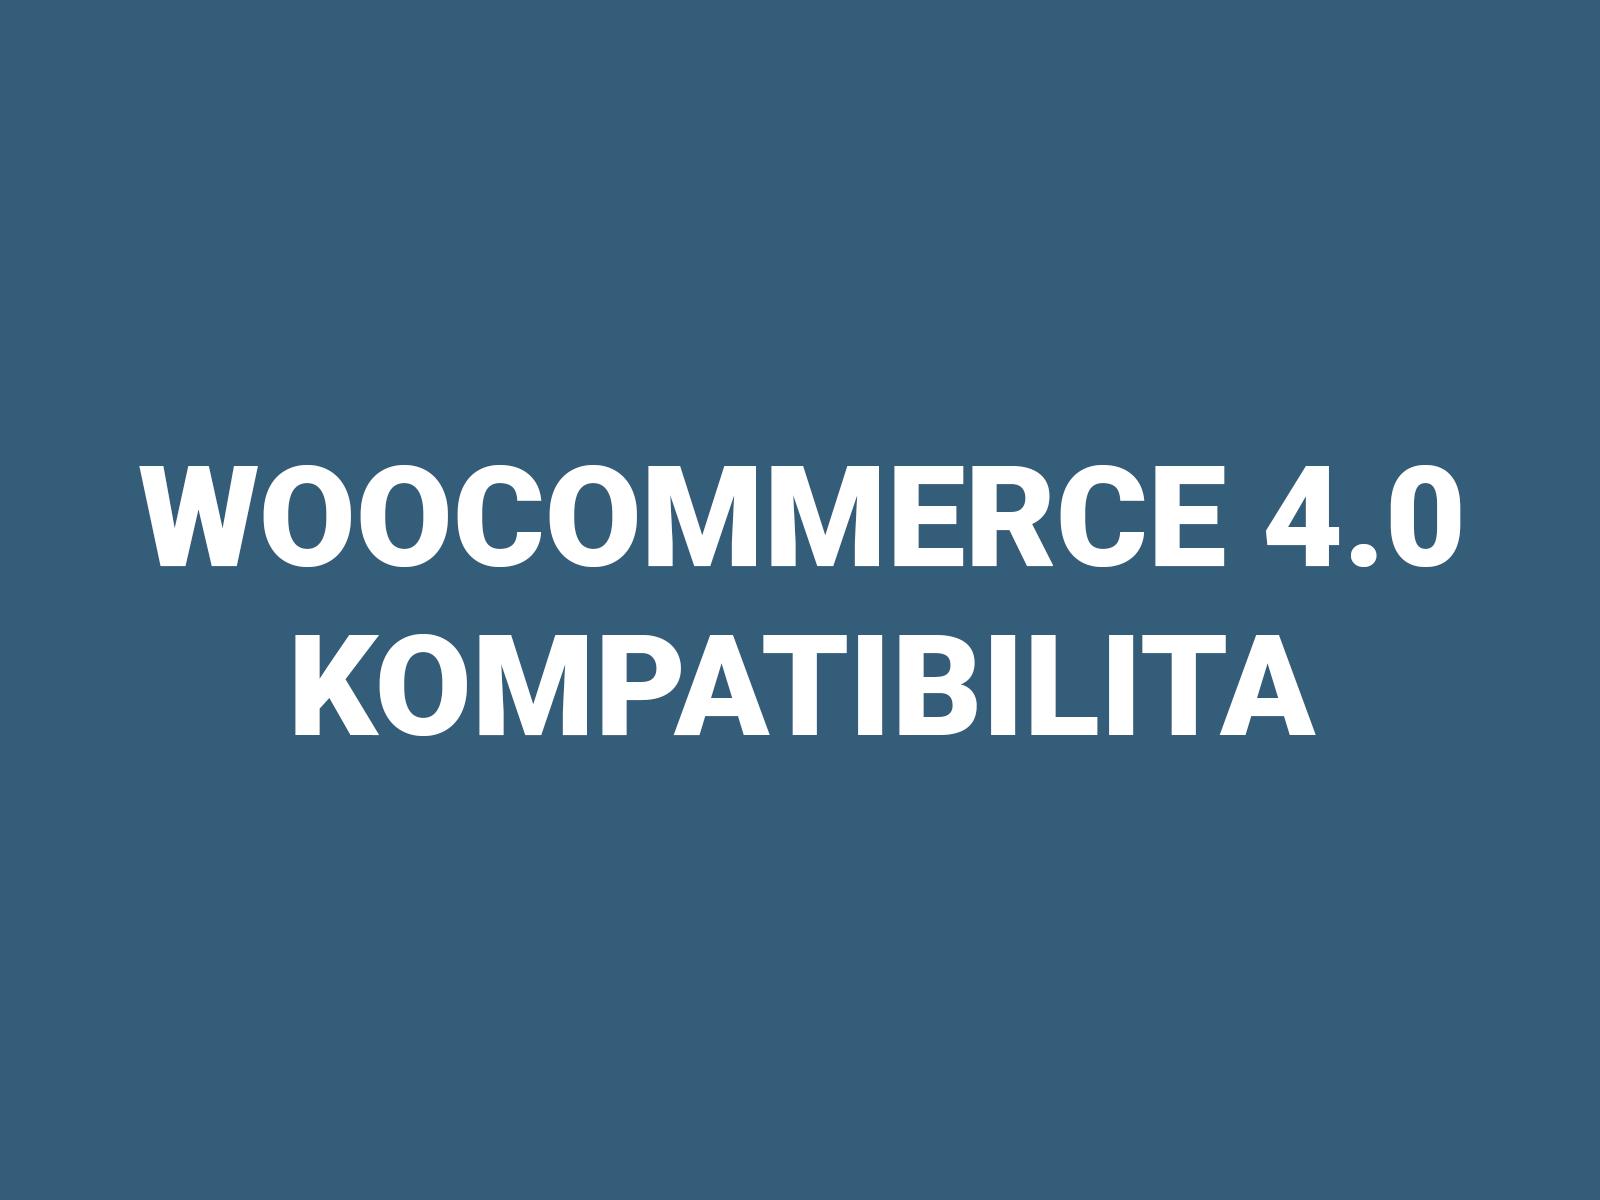 WooCommerce 4.0 kompatibilita